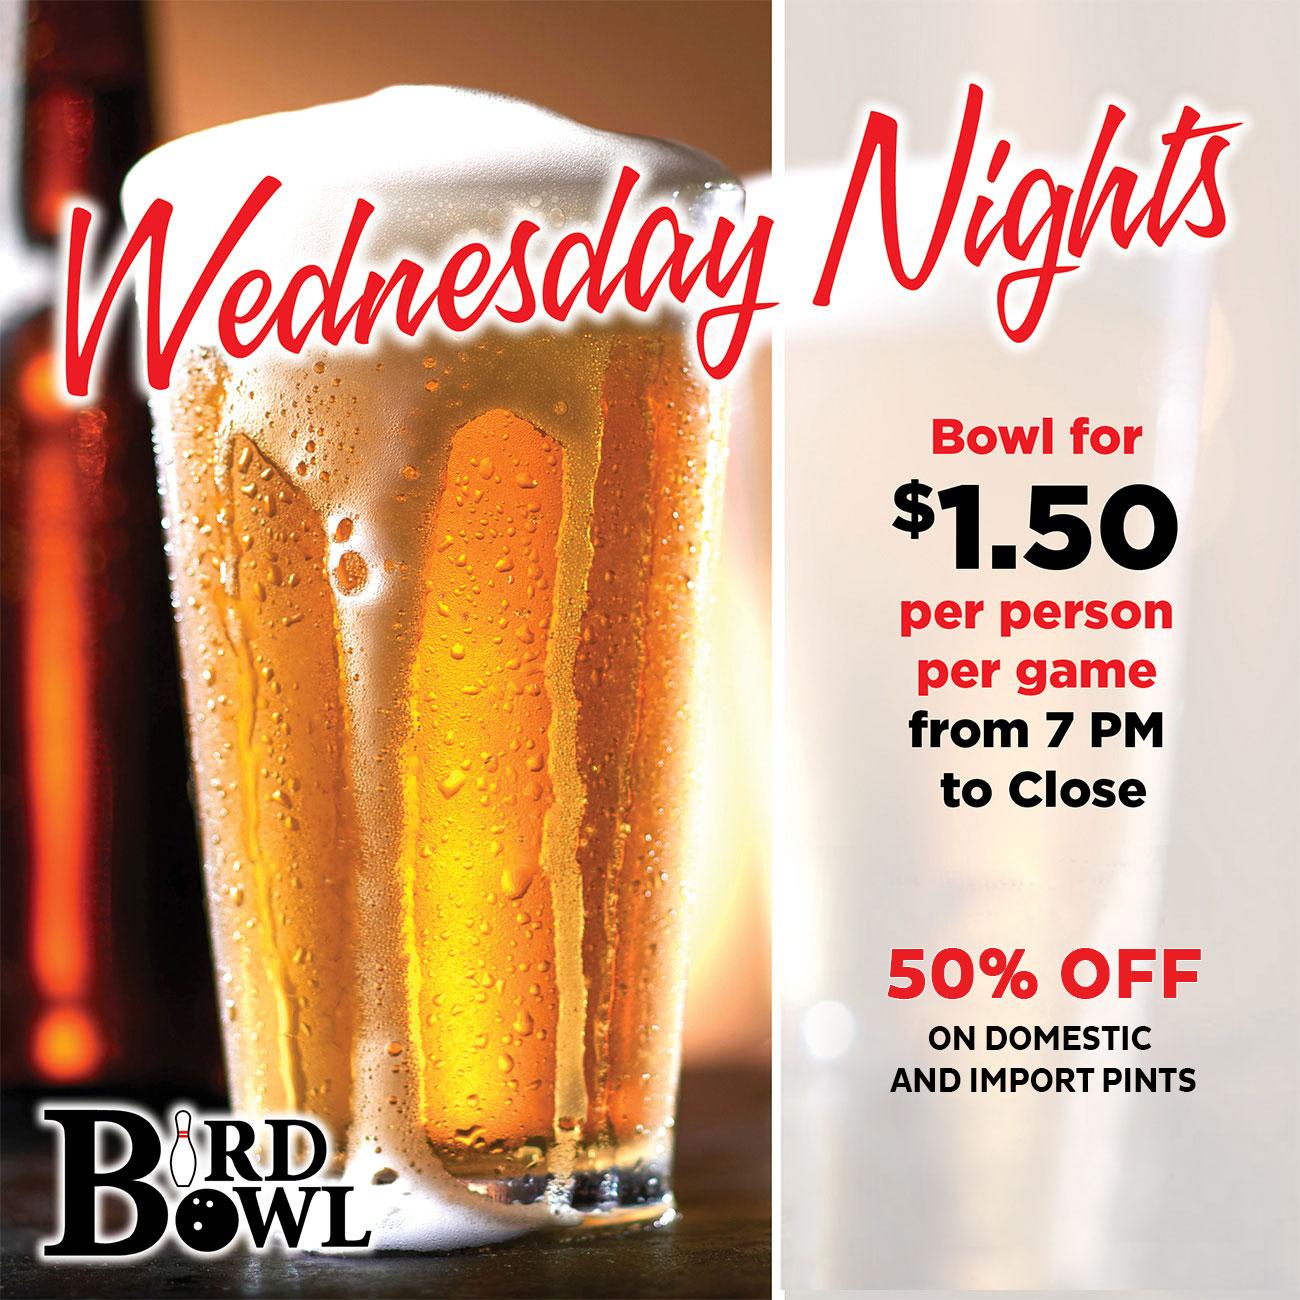 Wednesday Nights Specials